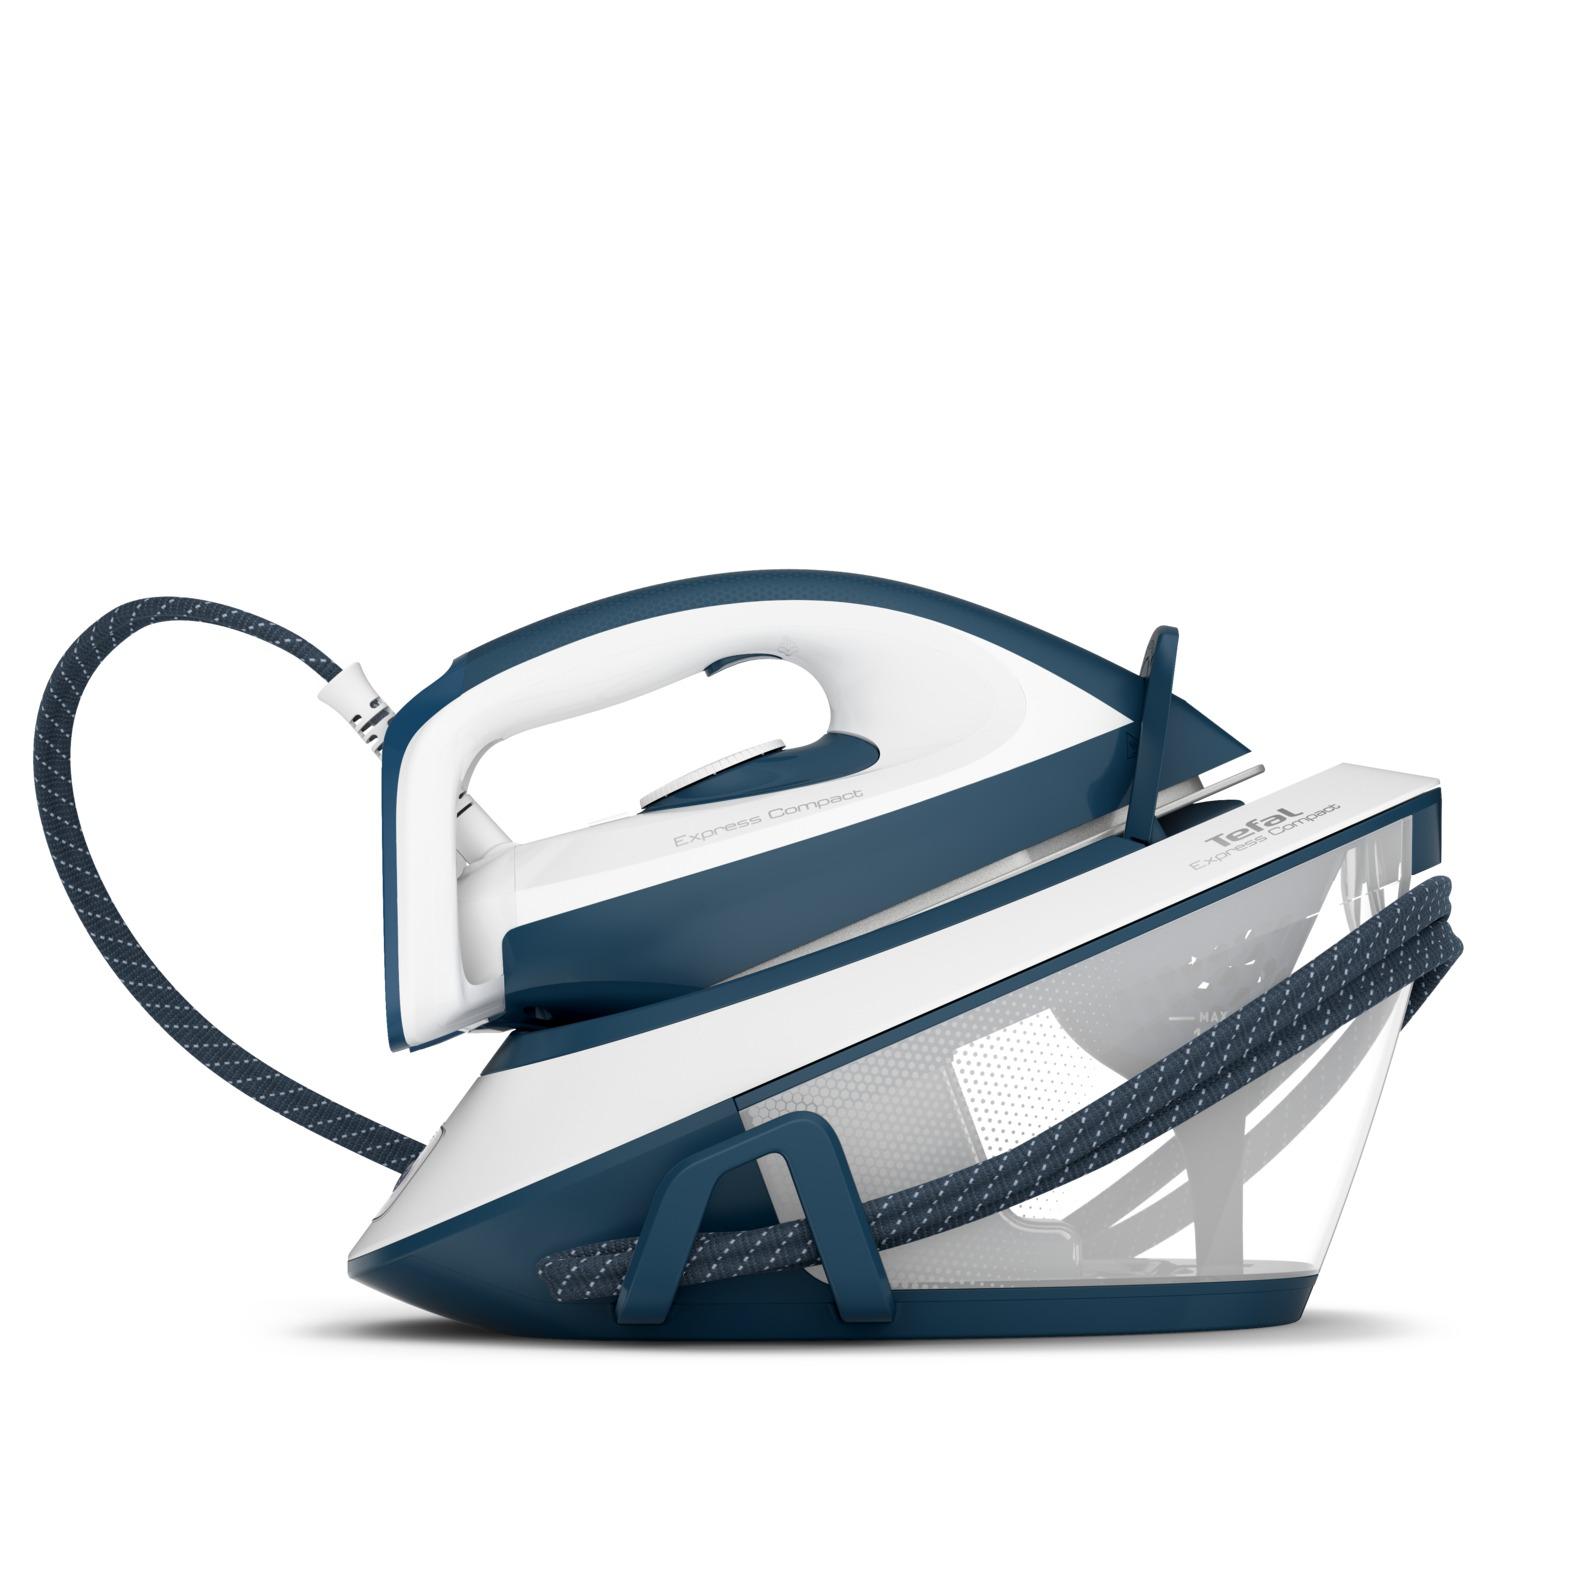 Tefal SV7110 strijksysteem